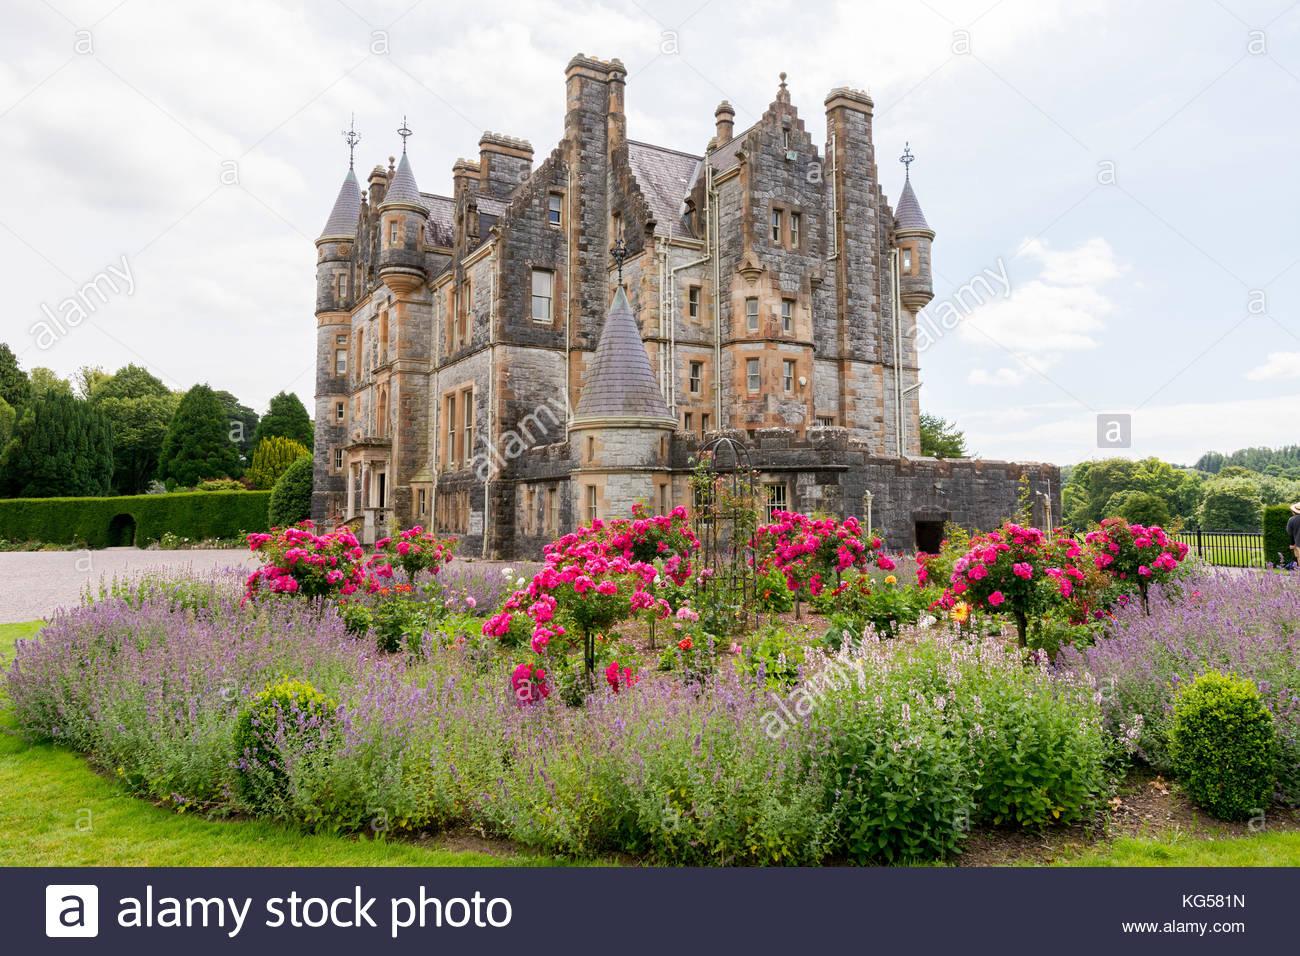 Landscapes of Ireland. Blarney castle, near Cork - Stock Image